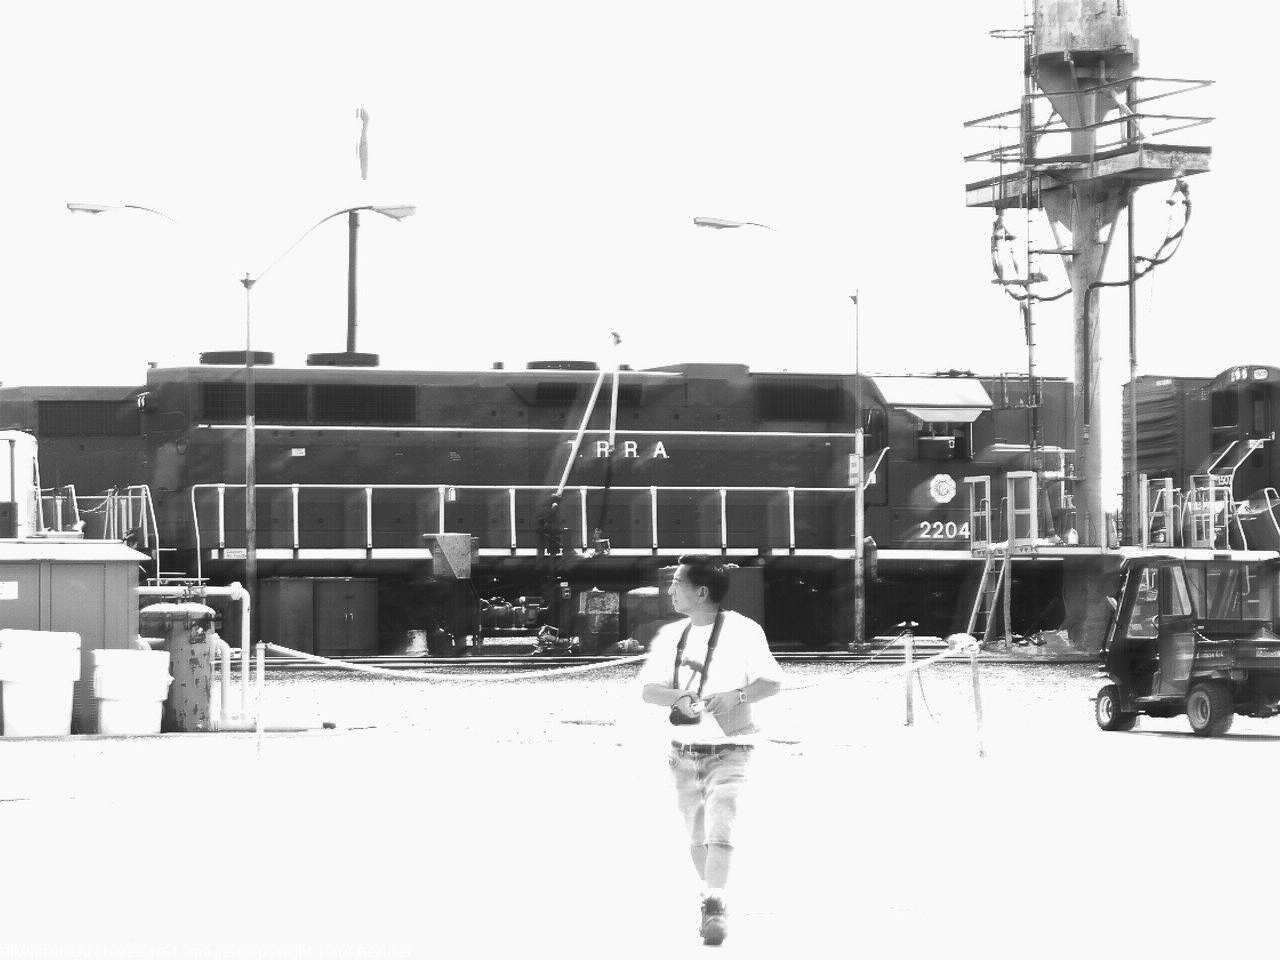 TRRA 2204   Description:    Photo Date:  7/10/2001  Location:  Madison, IL   Author:  Paul Bender  Categories:  Yard  Locomotives:  TRRA 2204(GP38-2)